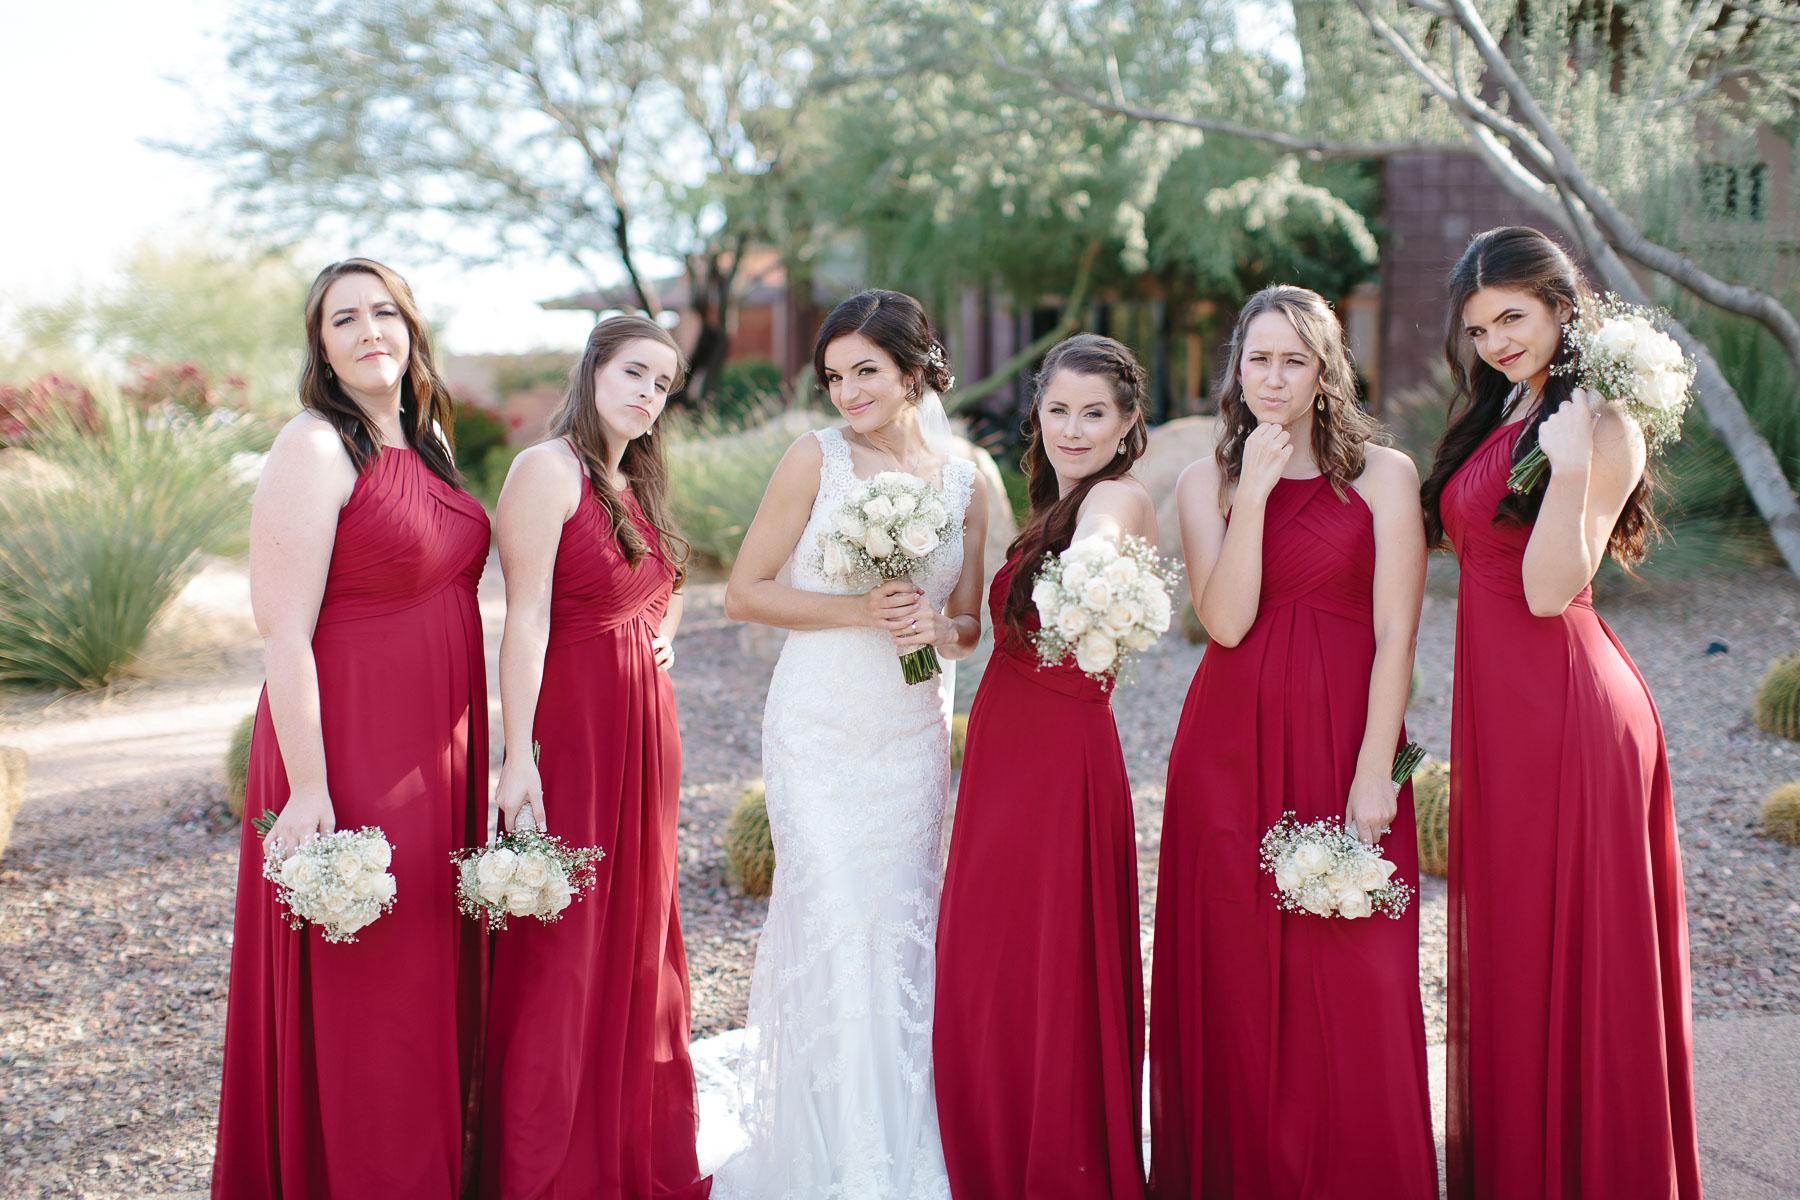 161210-Luxium-Weddings-Arizona-Matt-Jenny-Anthem-Golf-Country-Club-1015.jpg